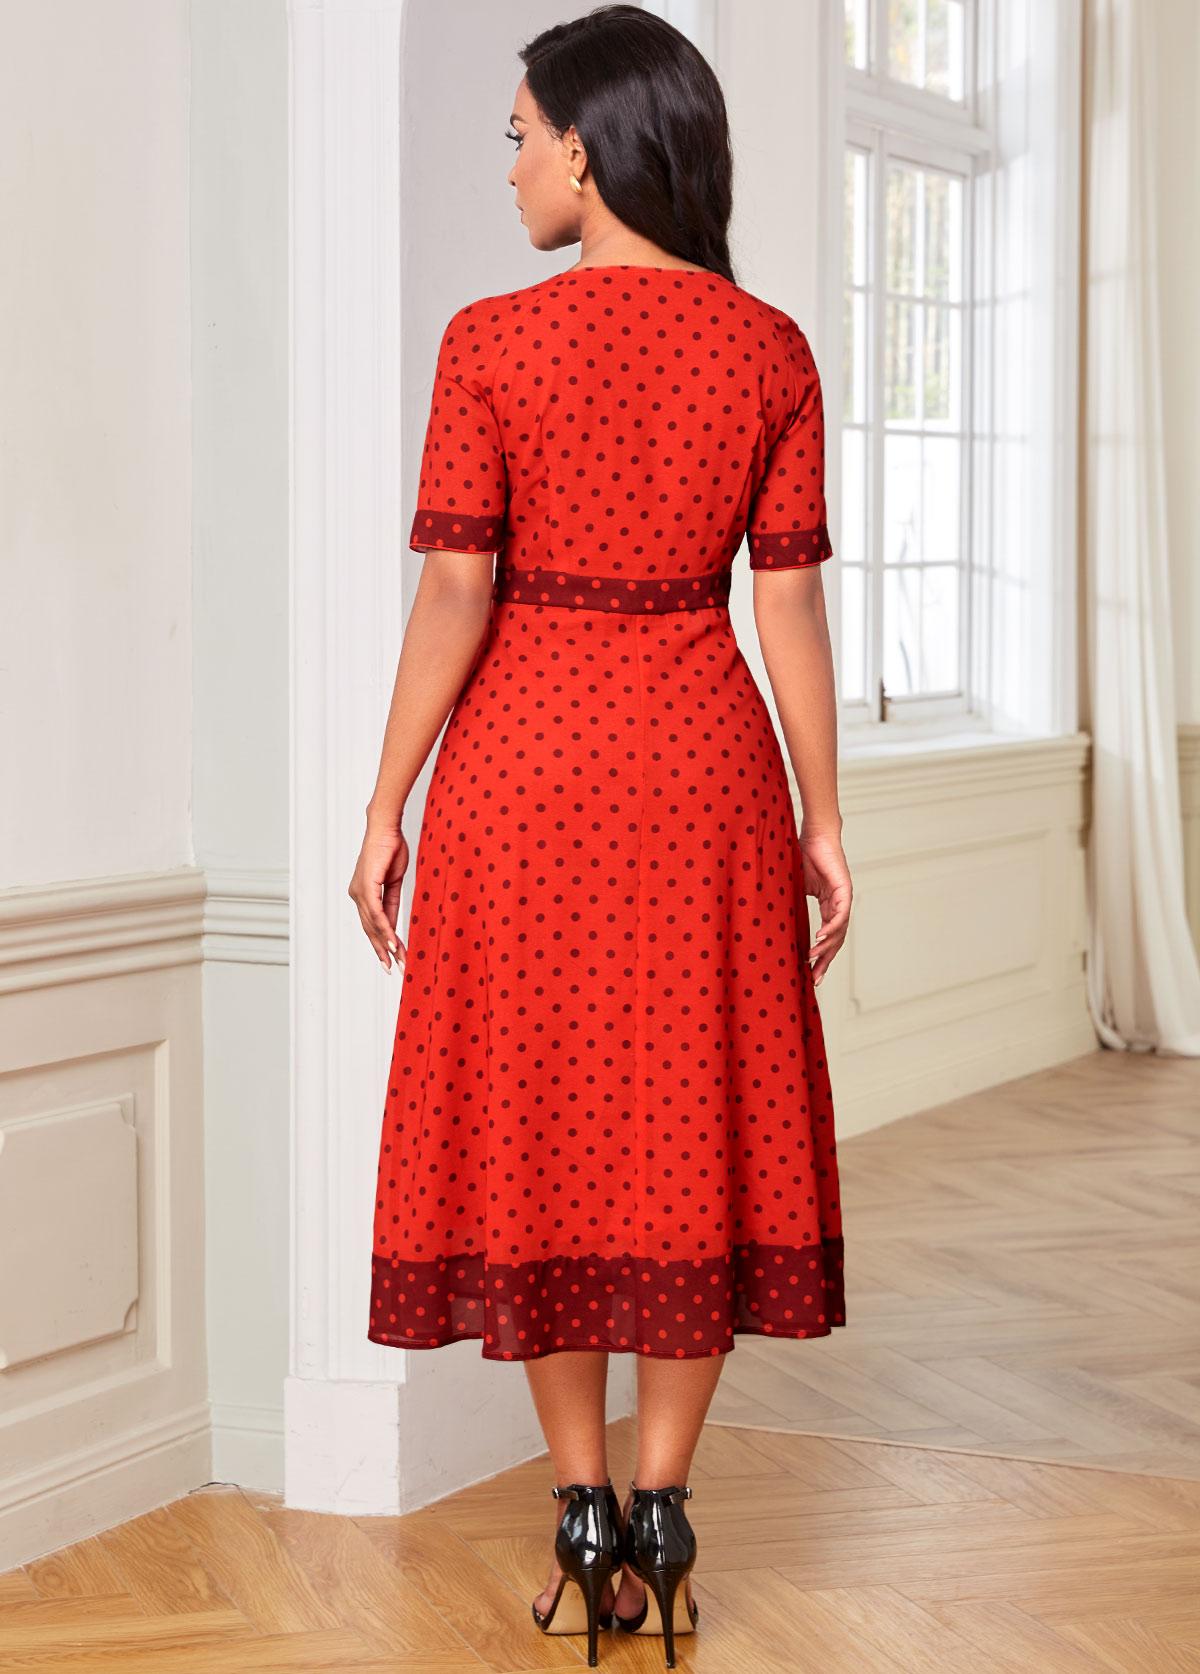 Bowknot Polka Dot Short Sleeve Dress